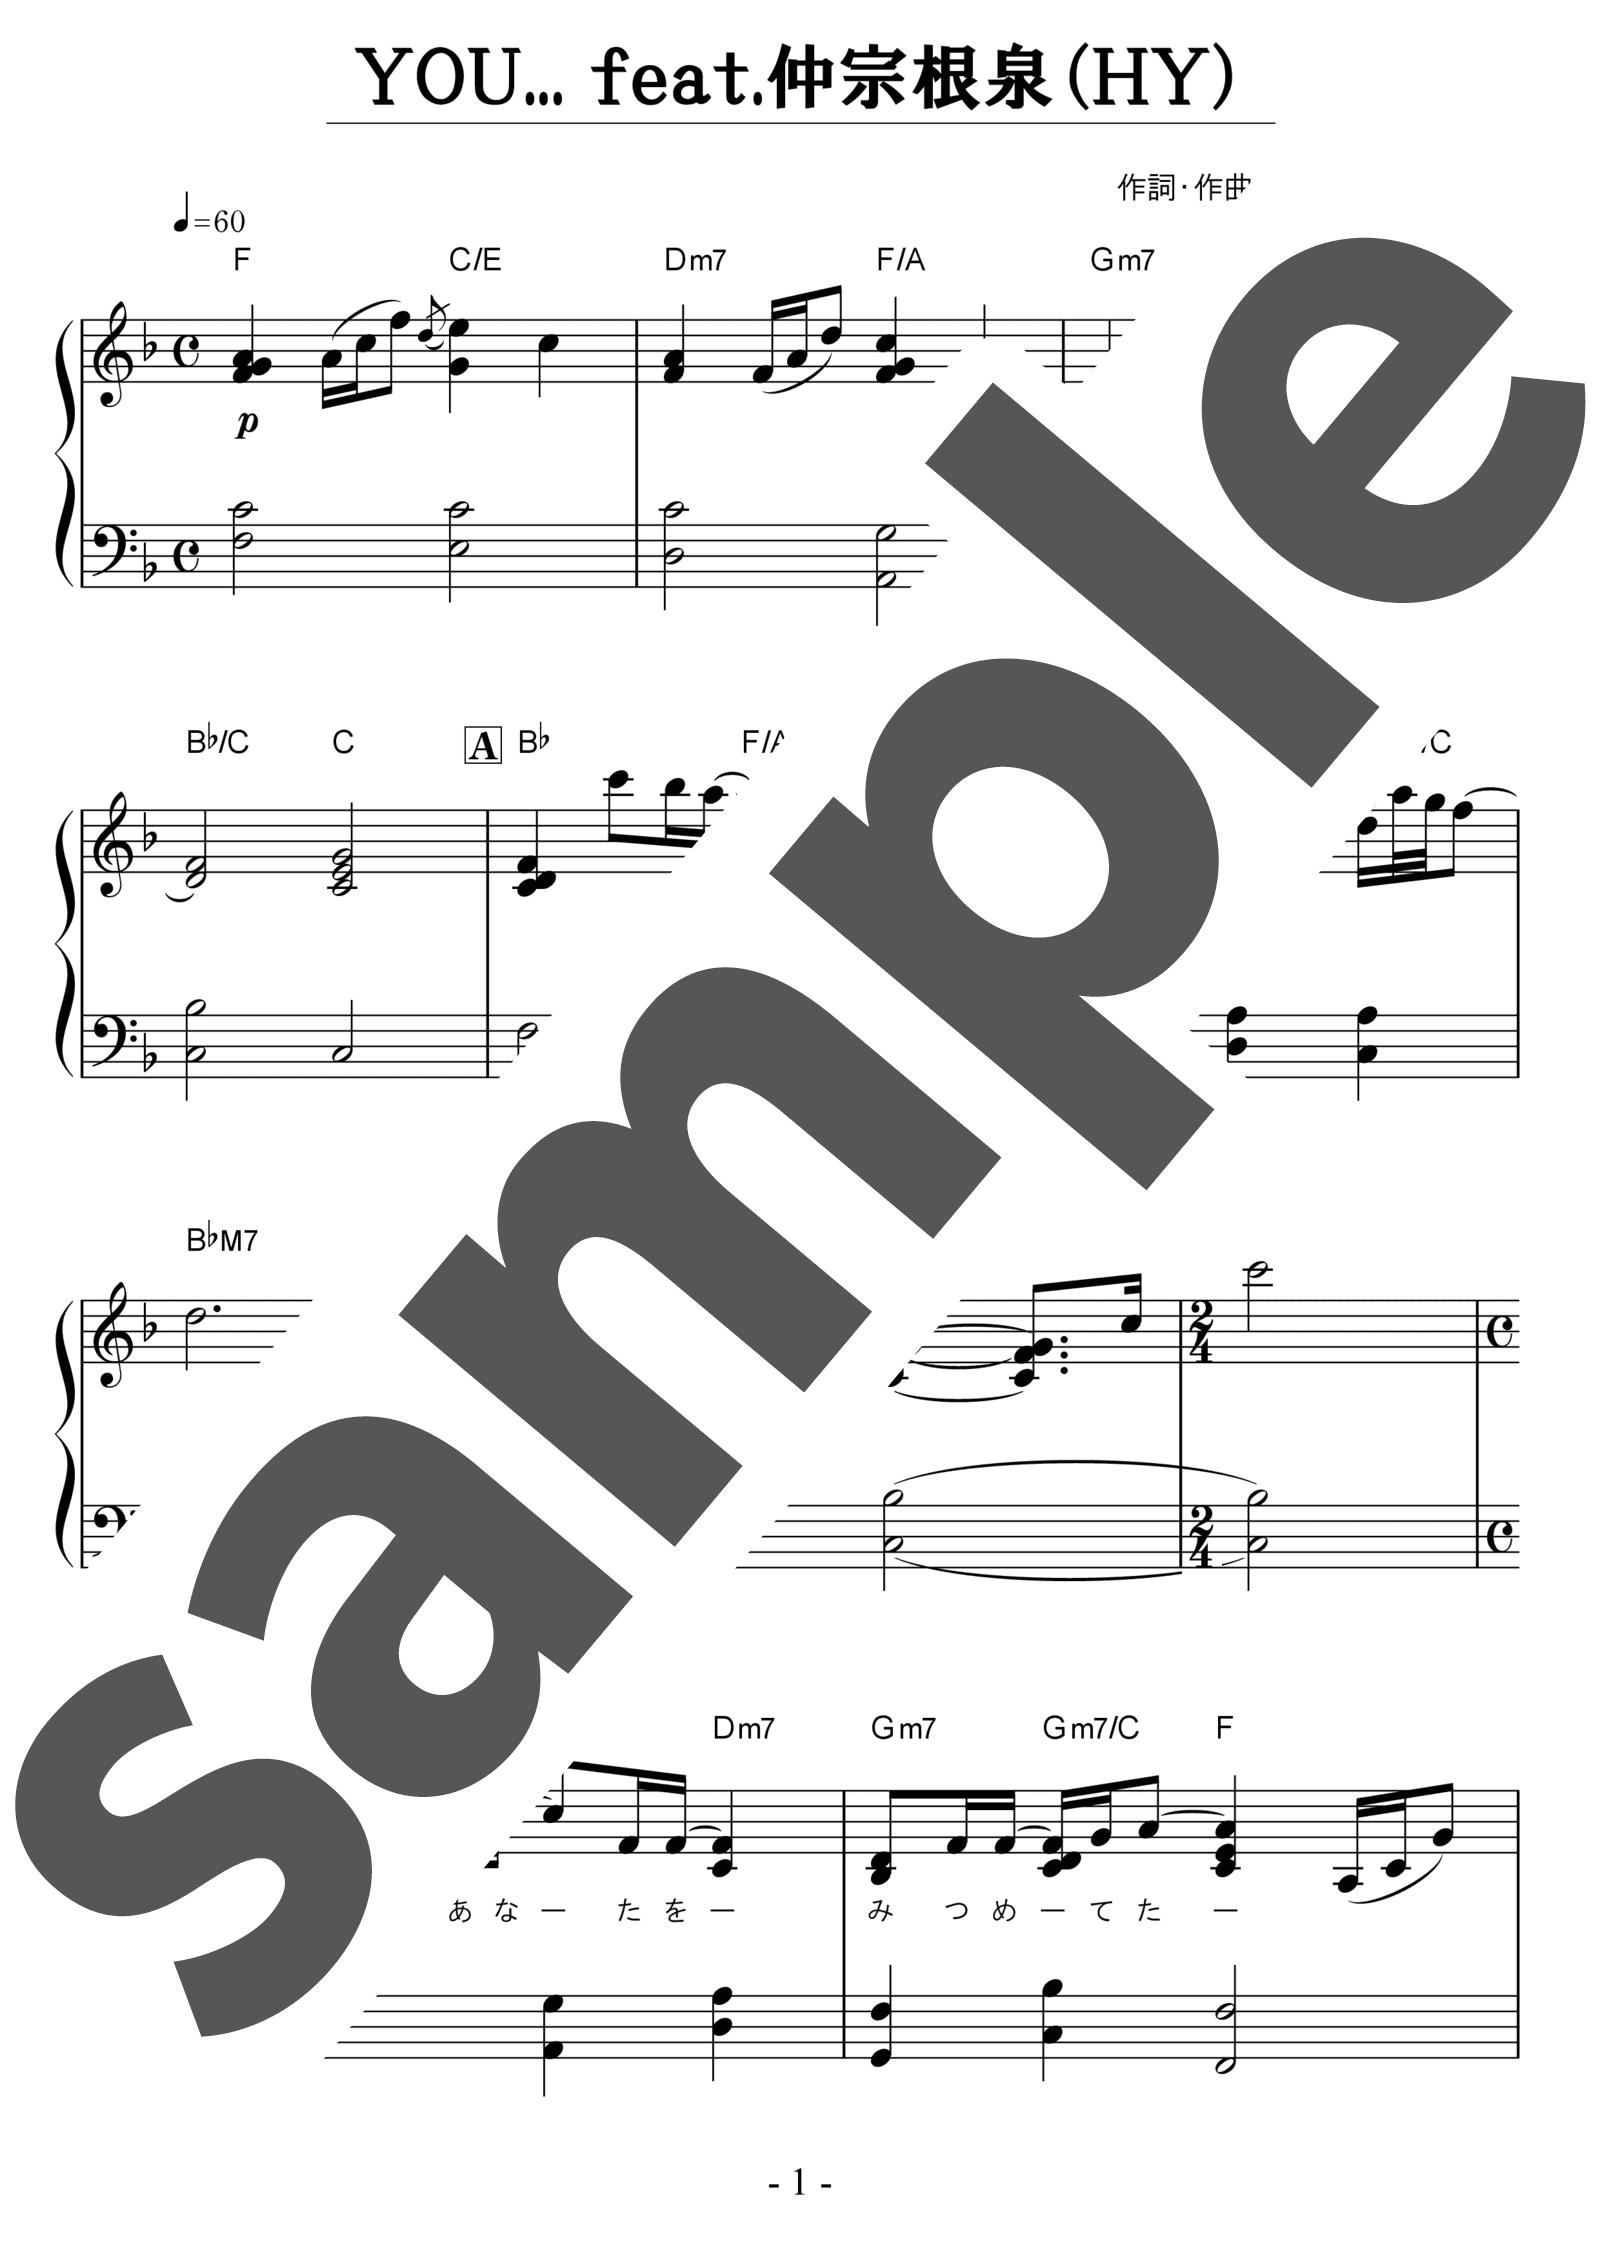 「YOU... feat. 仲宗根泉(HY)」のサンプル楽譜